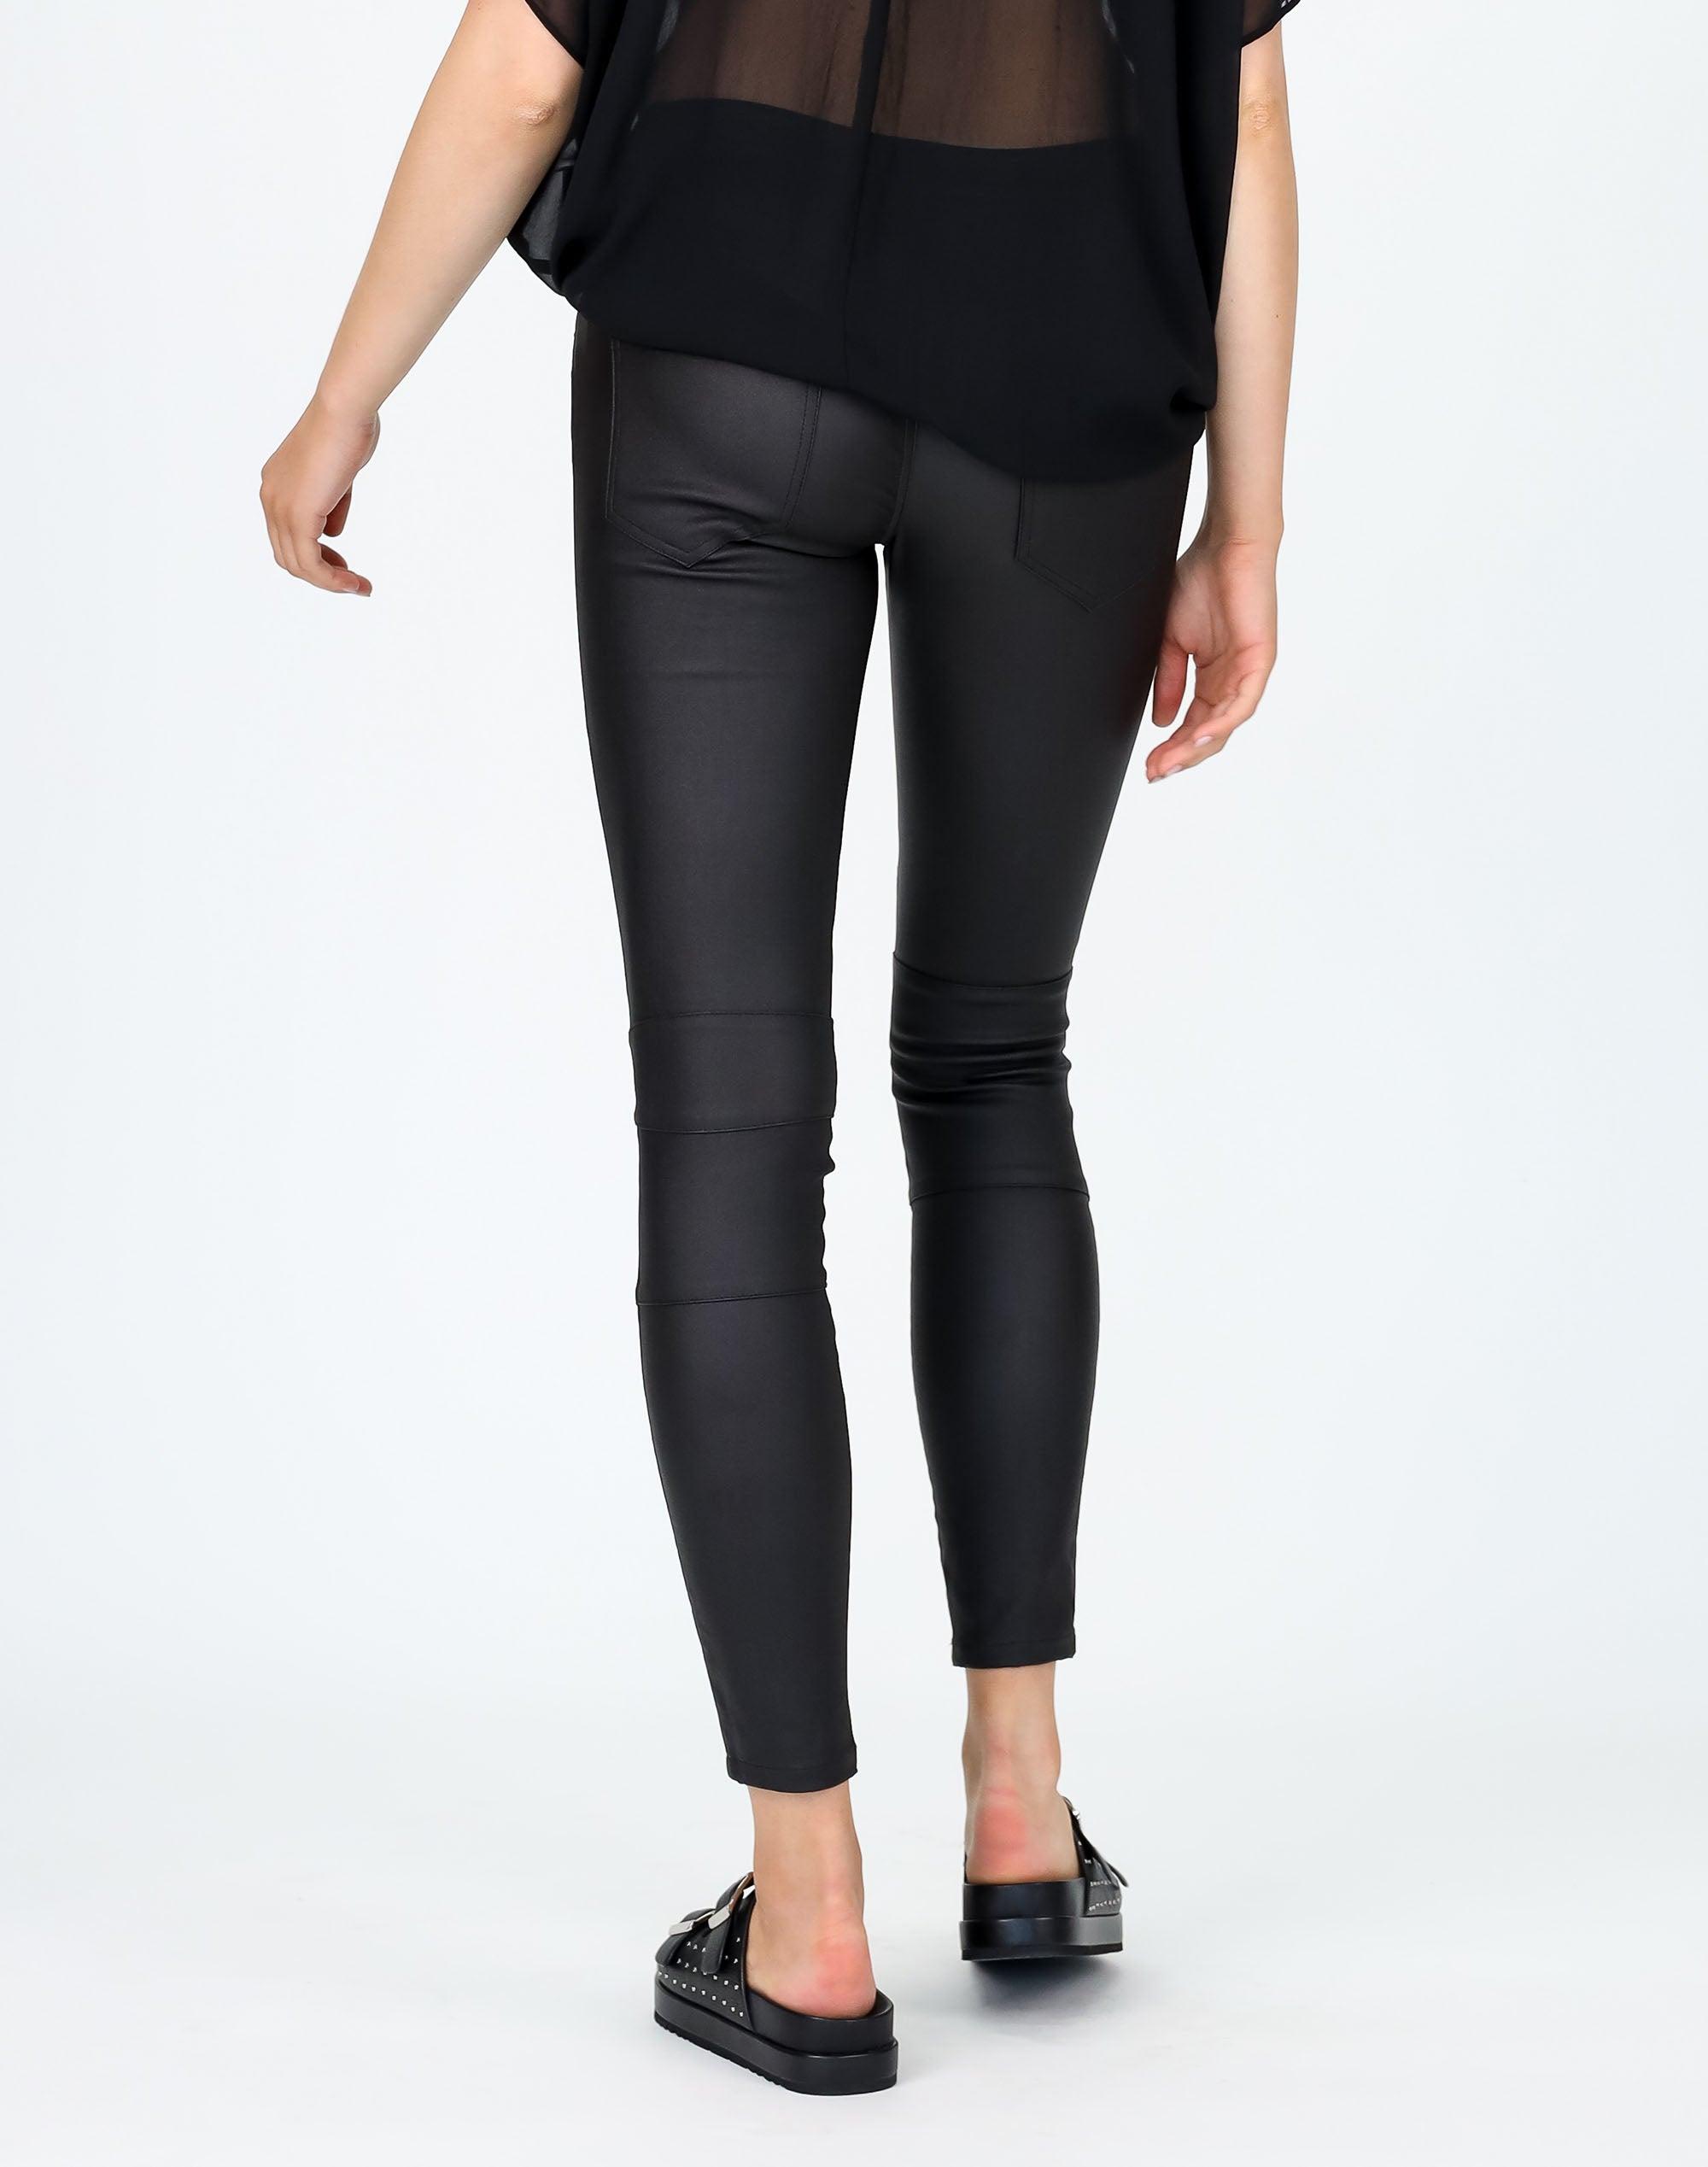 Mid Rise Zip Pocket Coated Pant